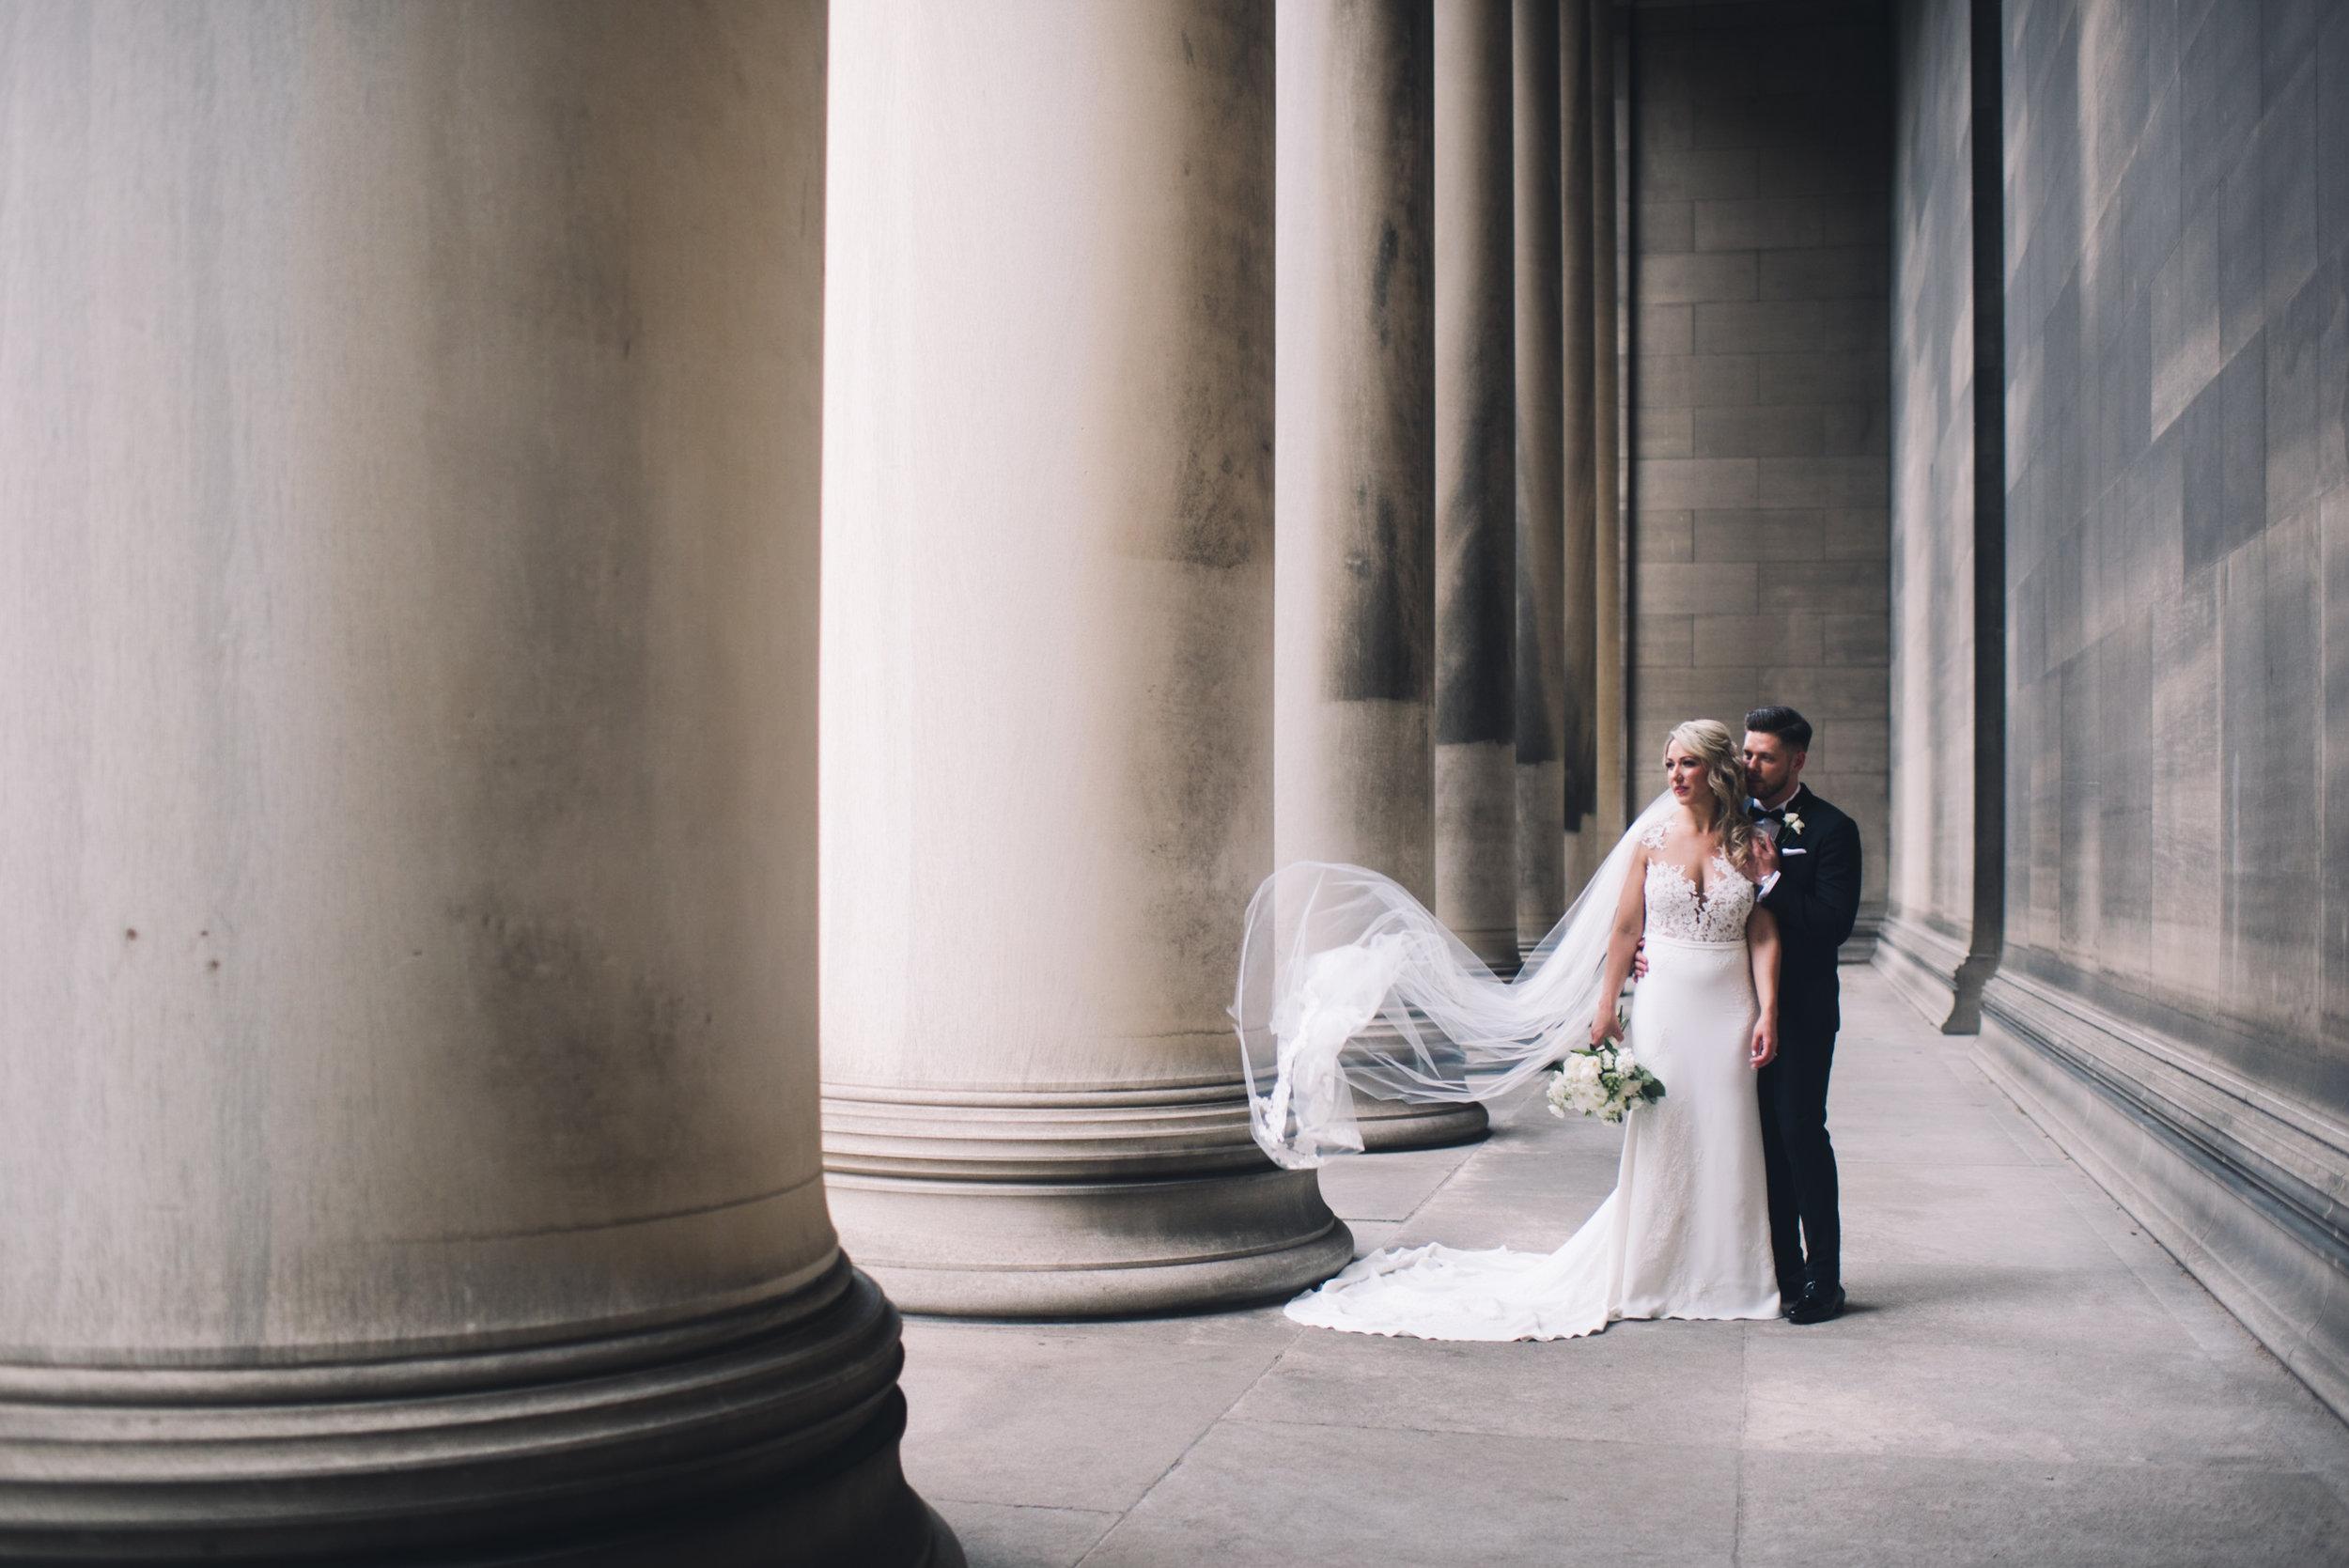 Pittsburgh Pennsylvania New York NYC Wedding Photographer Photojournalist Luxury Downtown Opera - Stirpe 895.jpg